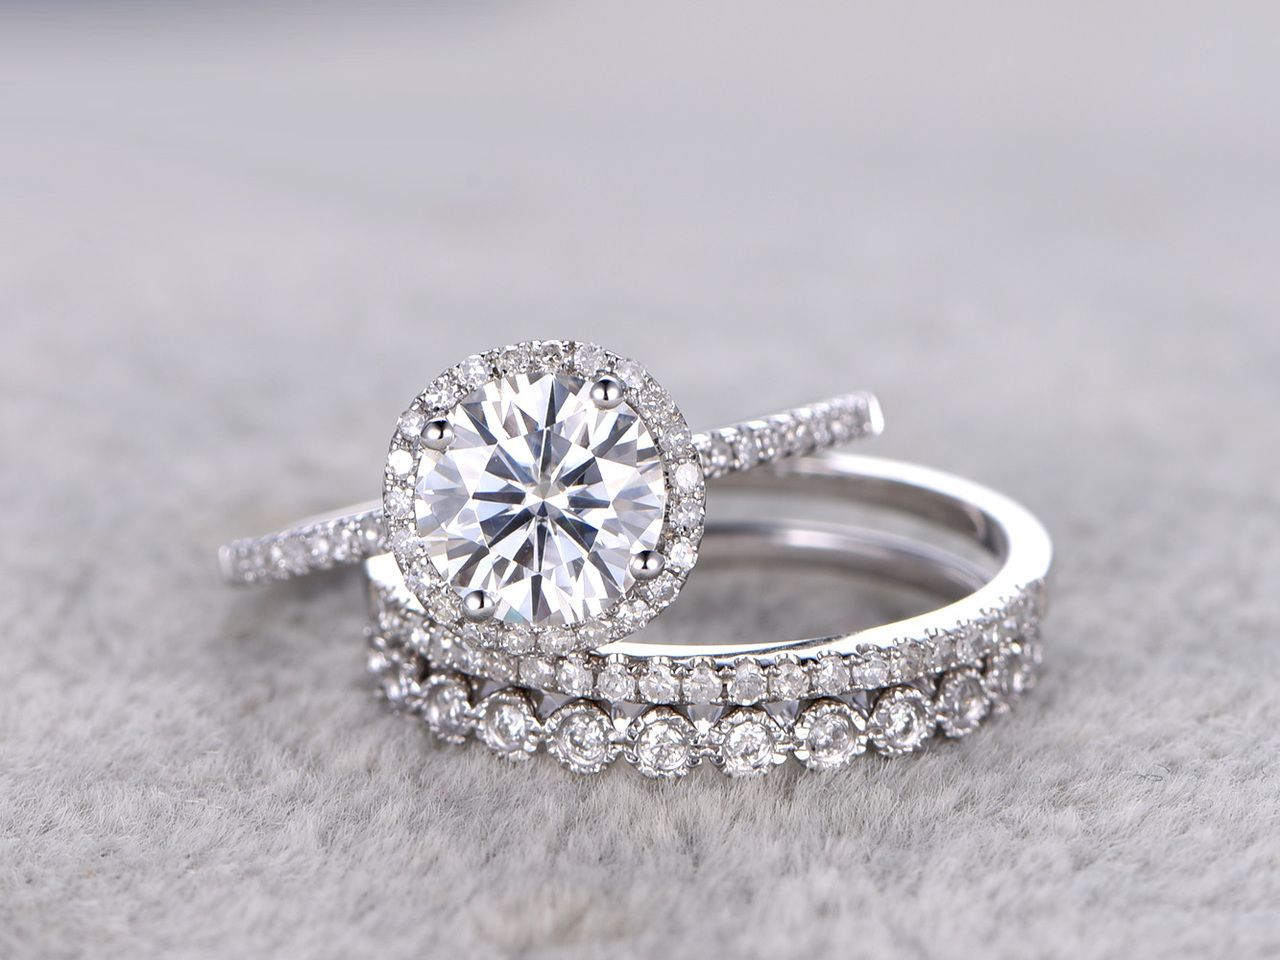 3pcs Moissanite Wedding Ring Set Diamond Matching Band White Gold